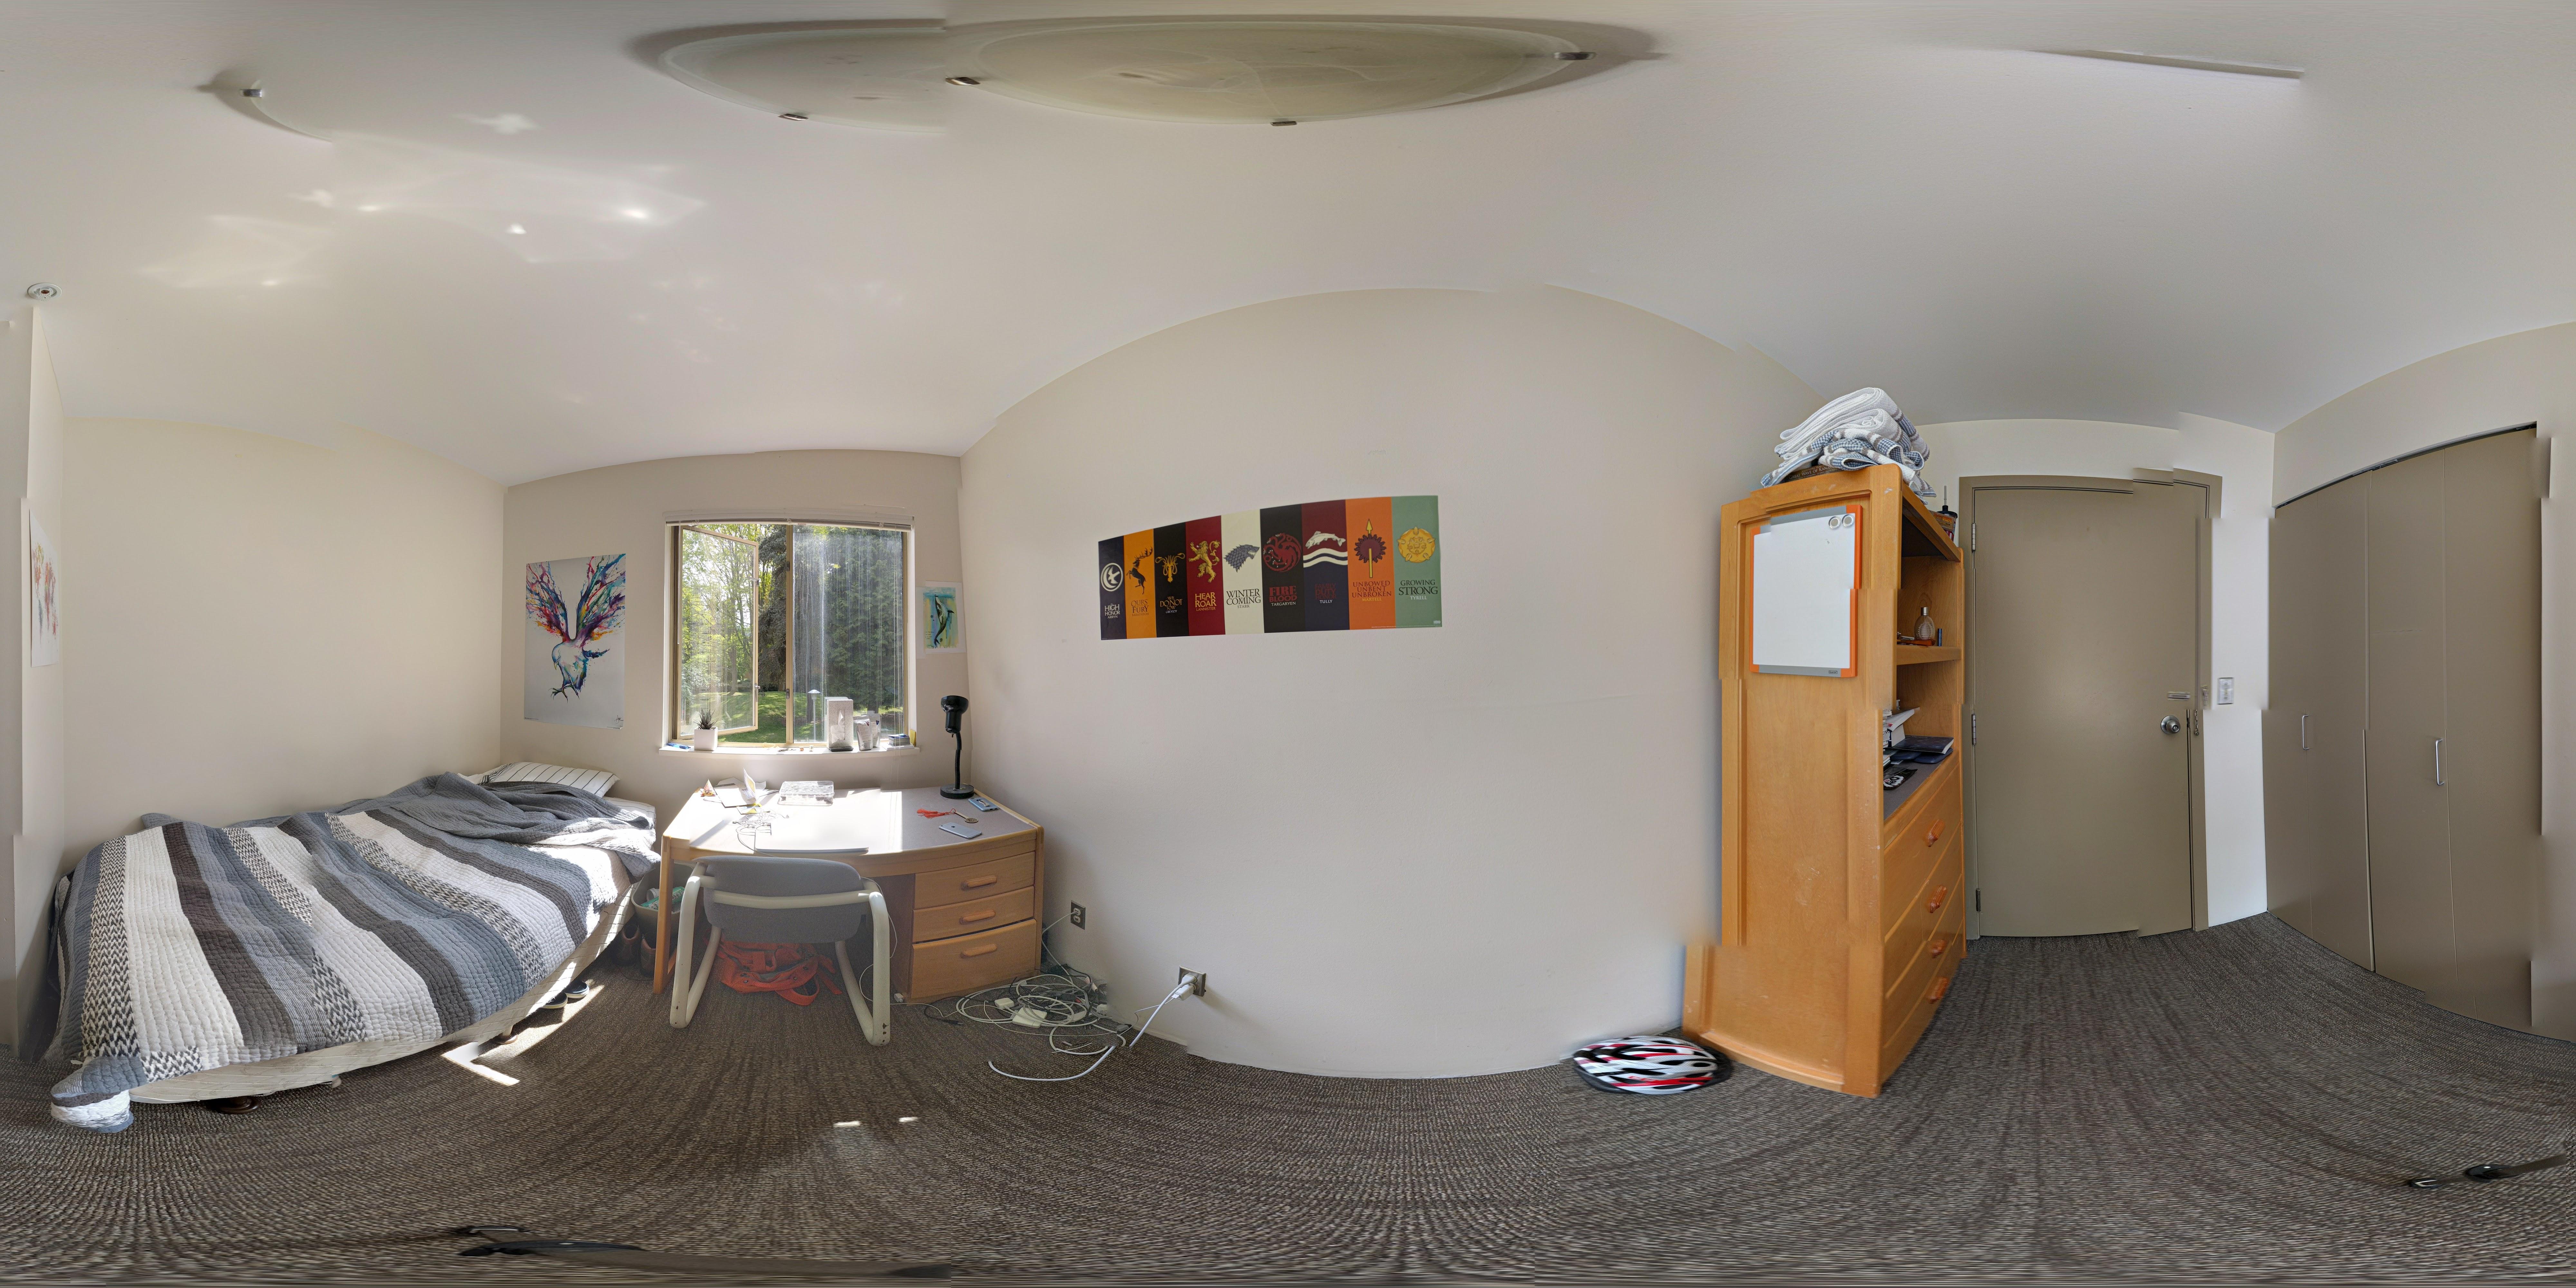 Ritsumeikan residence room.